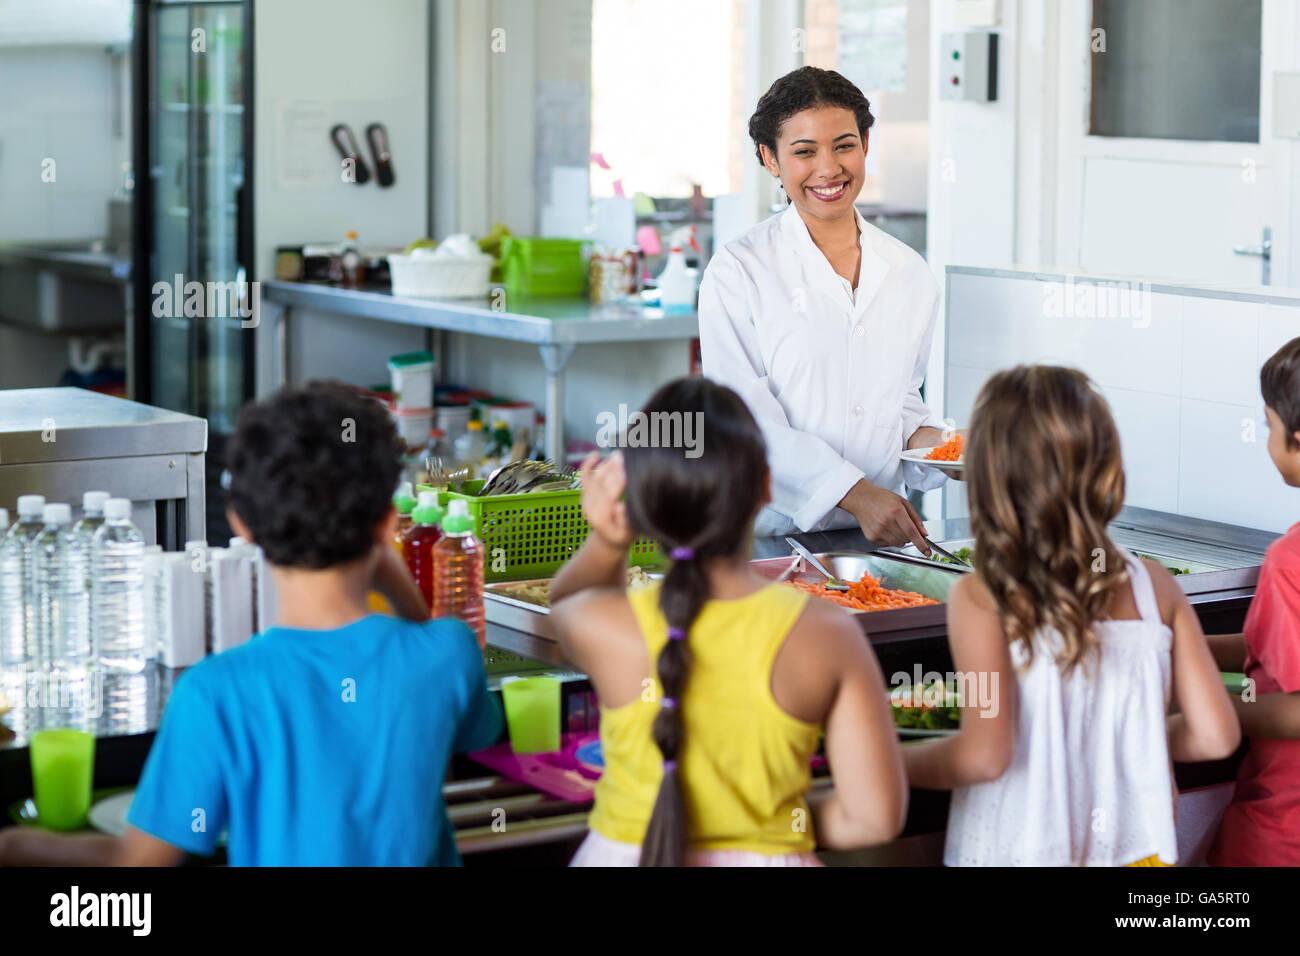 Woman serving food to schoolchildren - Stock Image